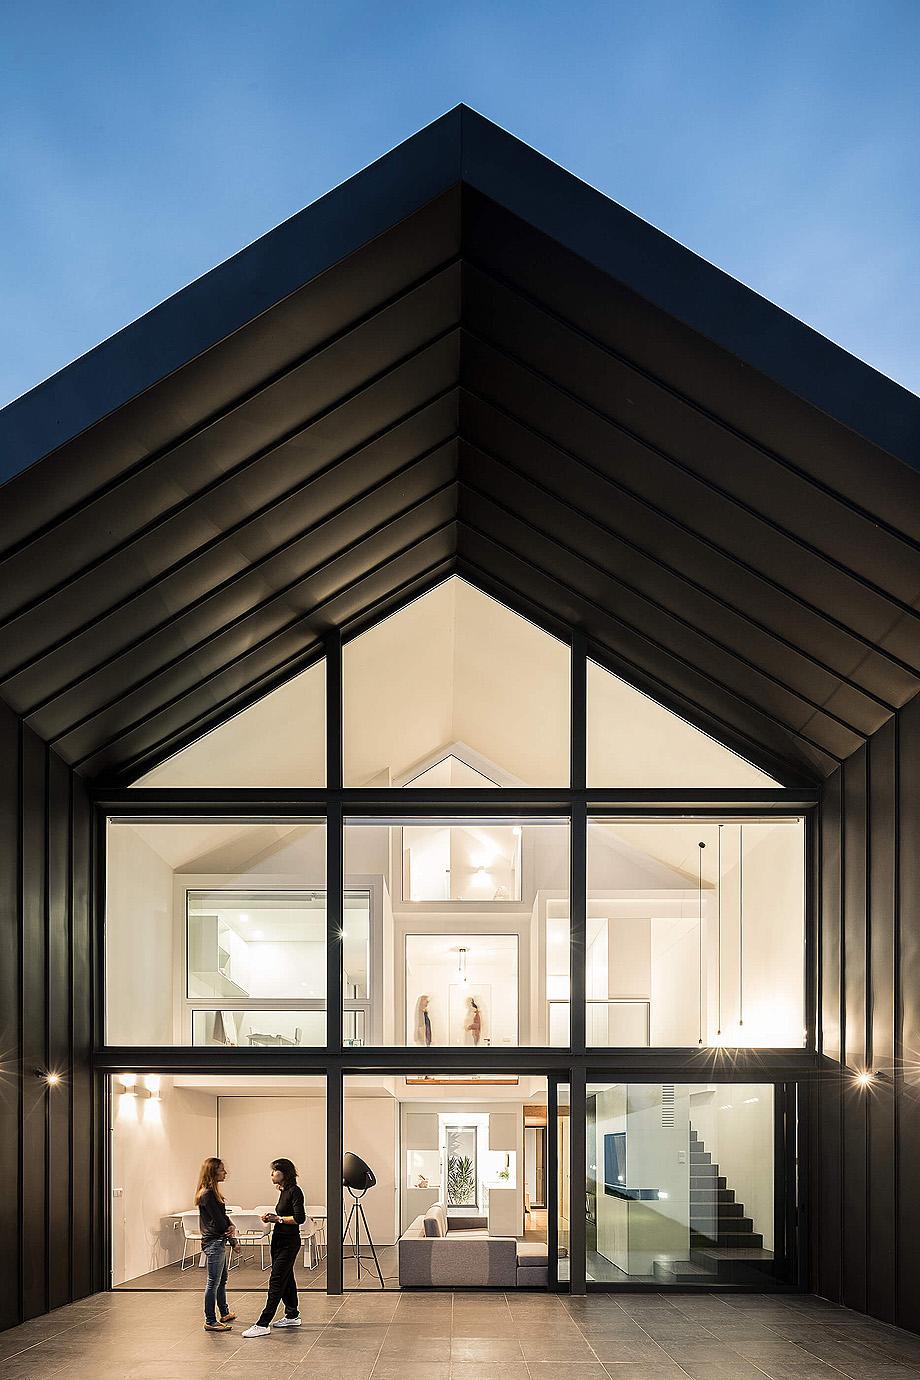 casa do arco de frari architecture network - foto ivo tavares (39)